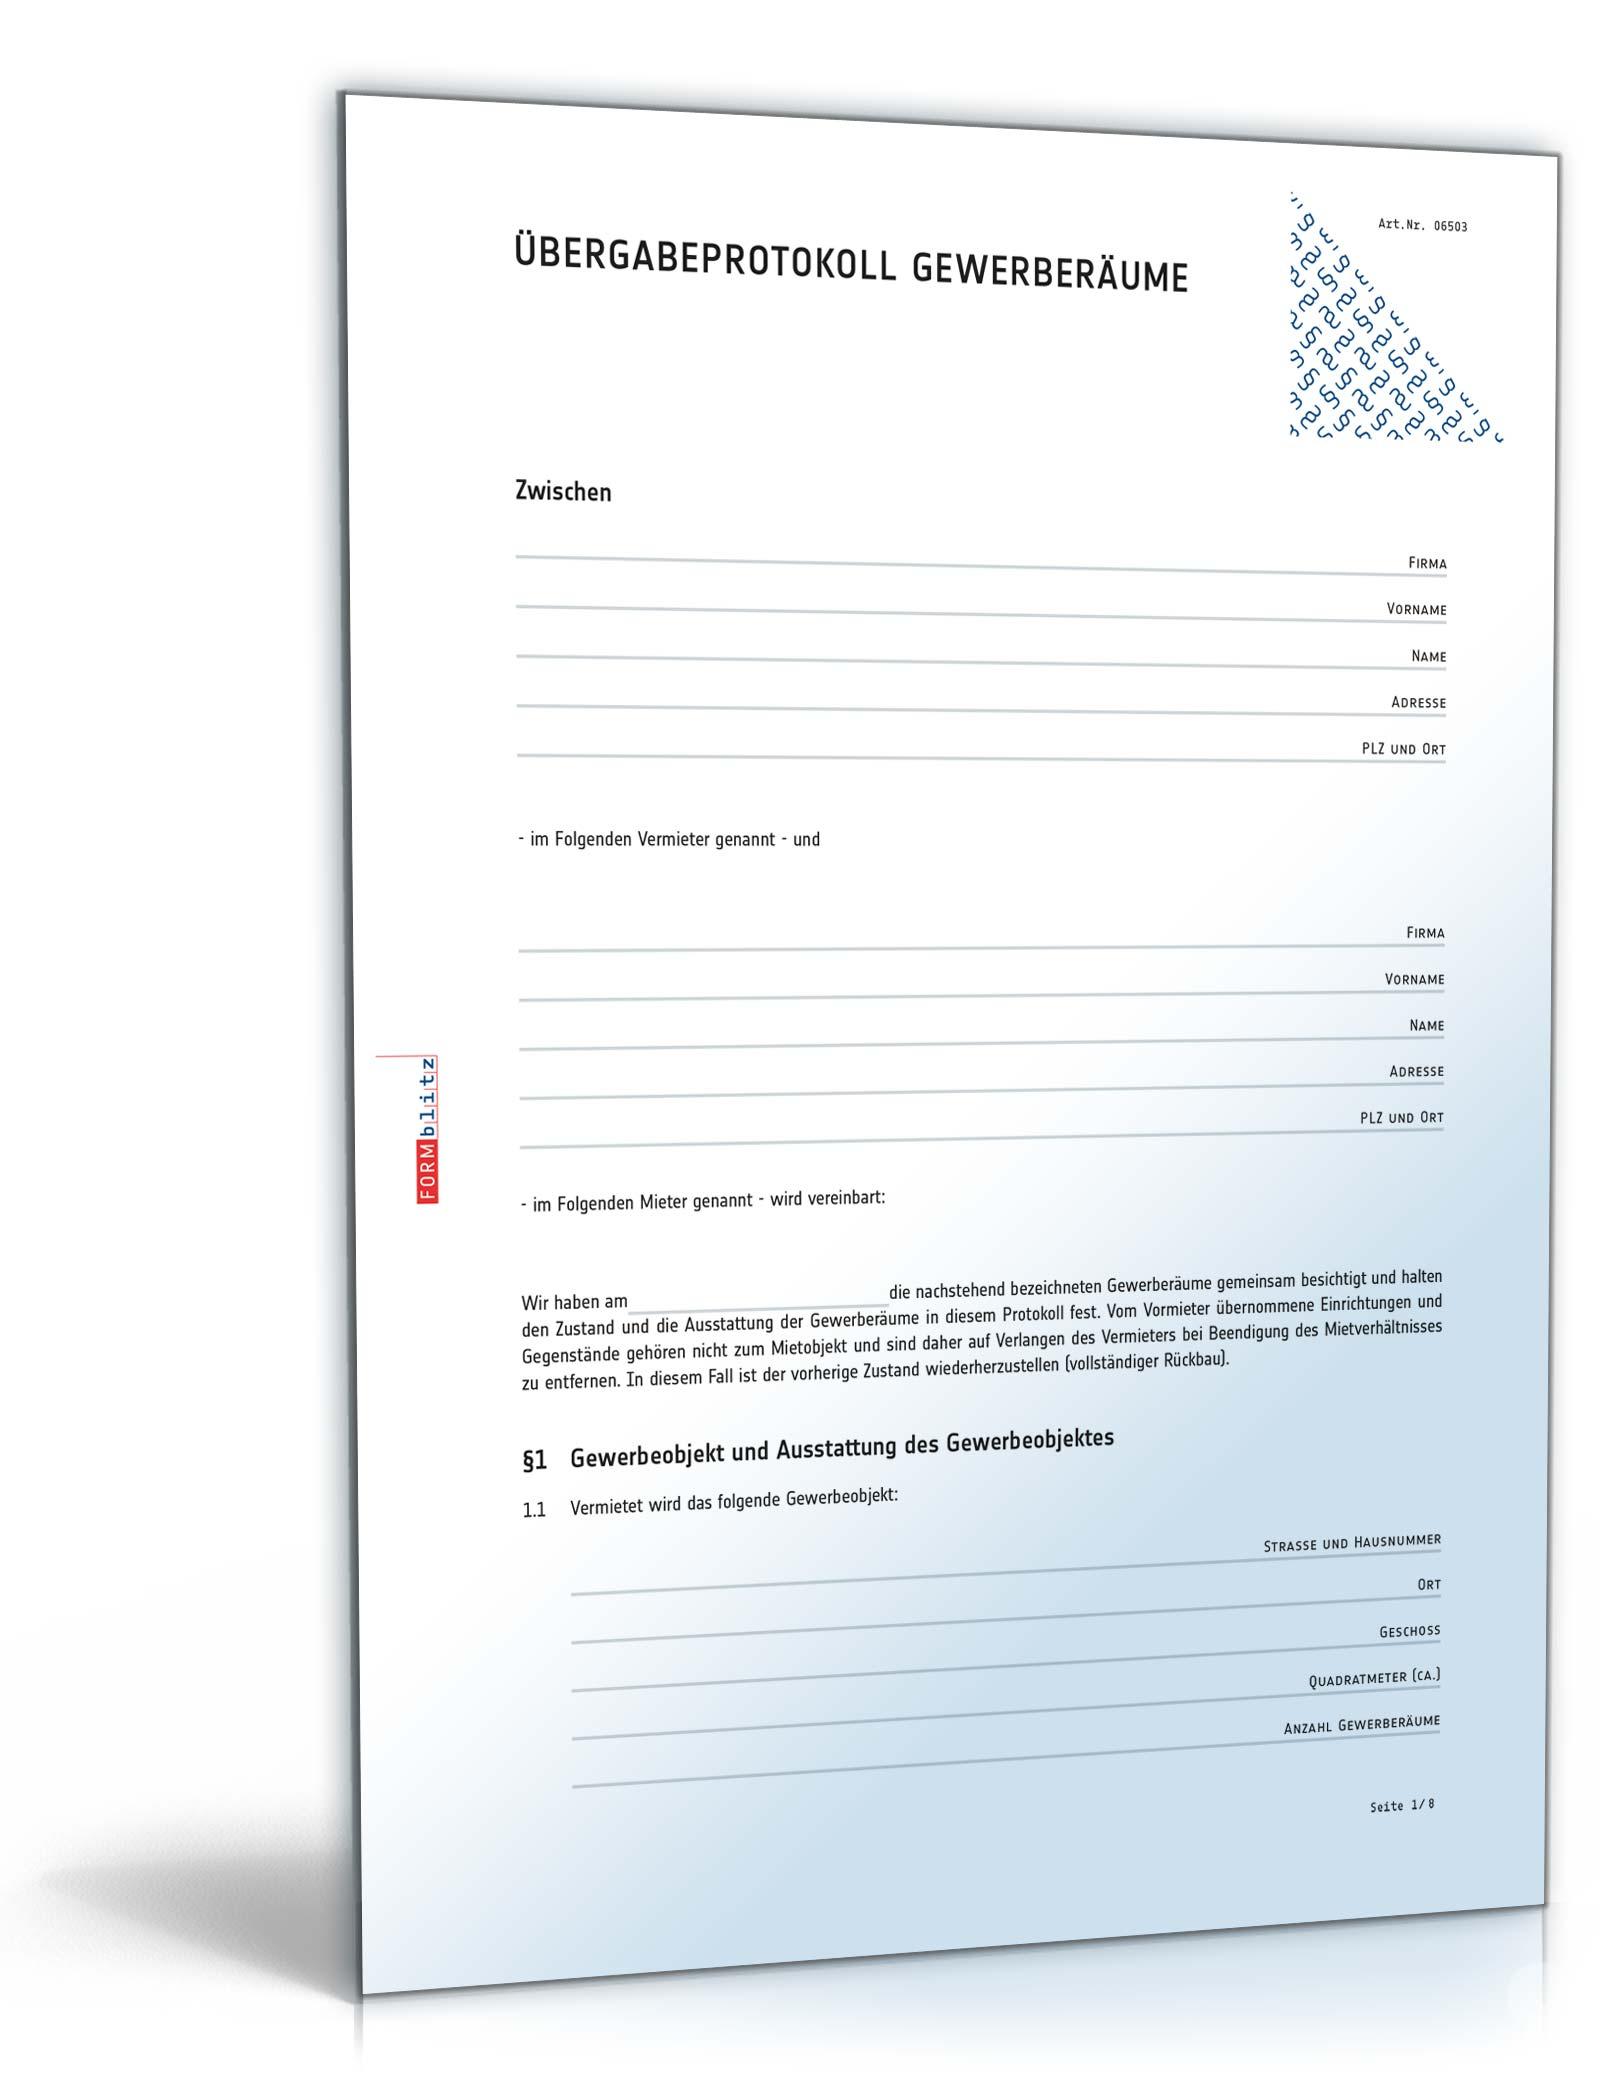 bergabeprotokoll gewerberume muster zum download - Ubergabeprotokoll Mietwohnung Muster